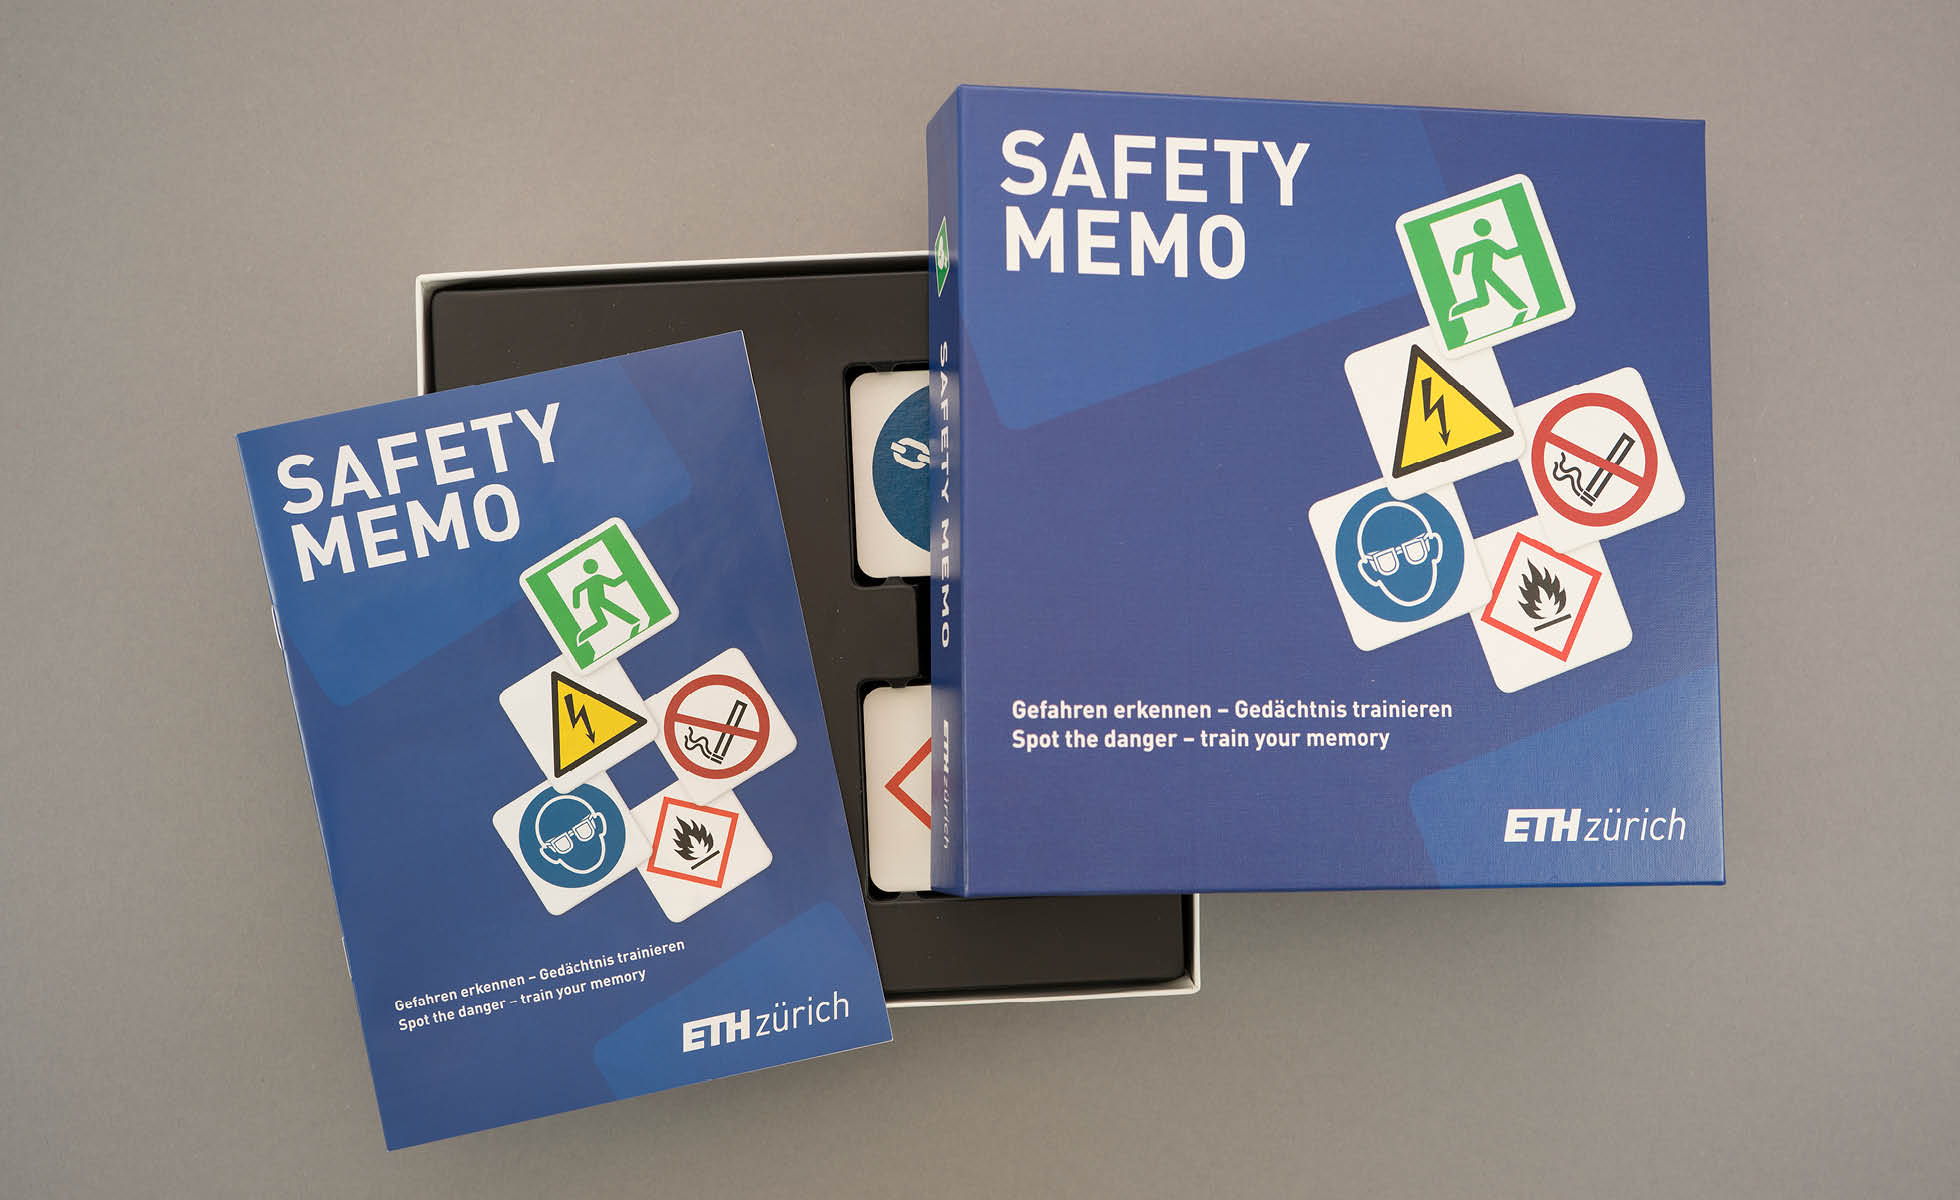 diverses_safety_memo_ETH_02.jpg